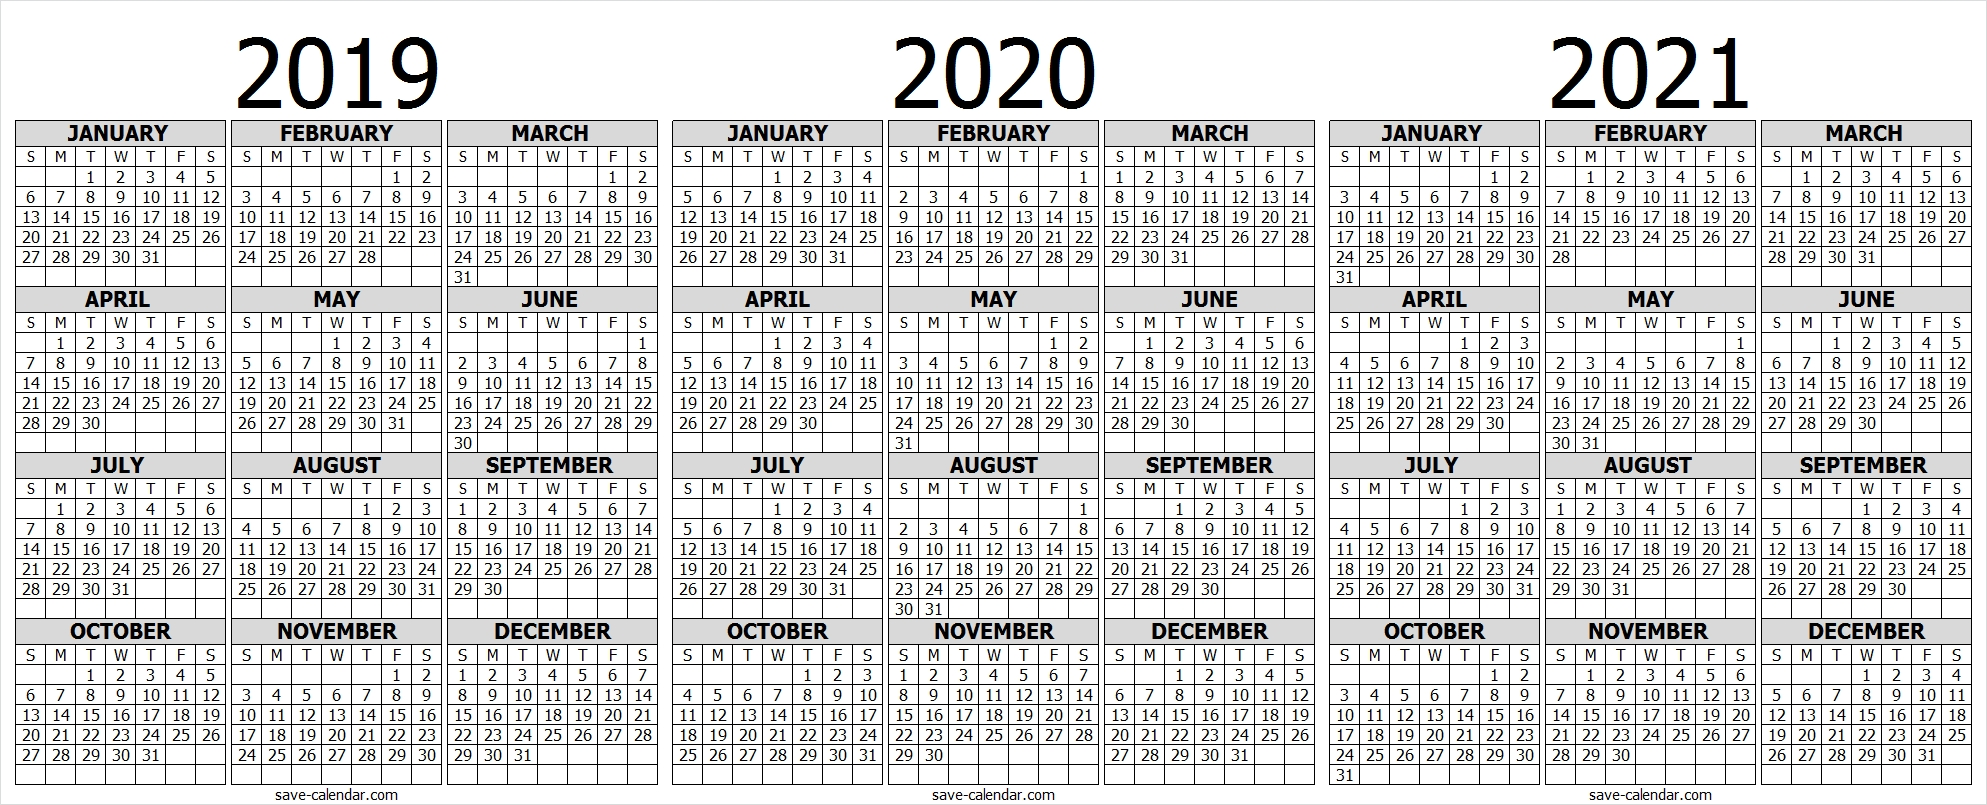 2019 2020 2021 Calendar To Print | Print Calendar, 2021 in 2019 2020 2021 Printable Calendar